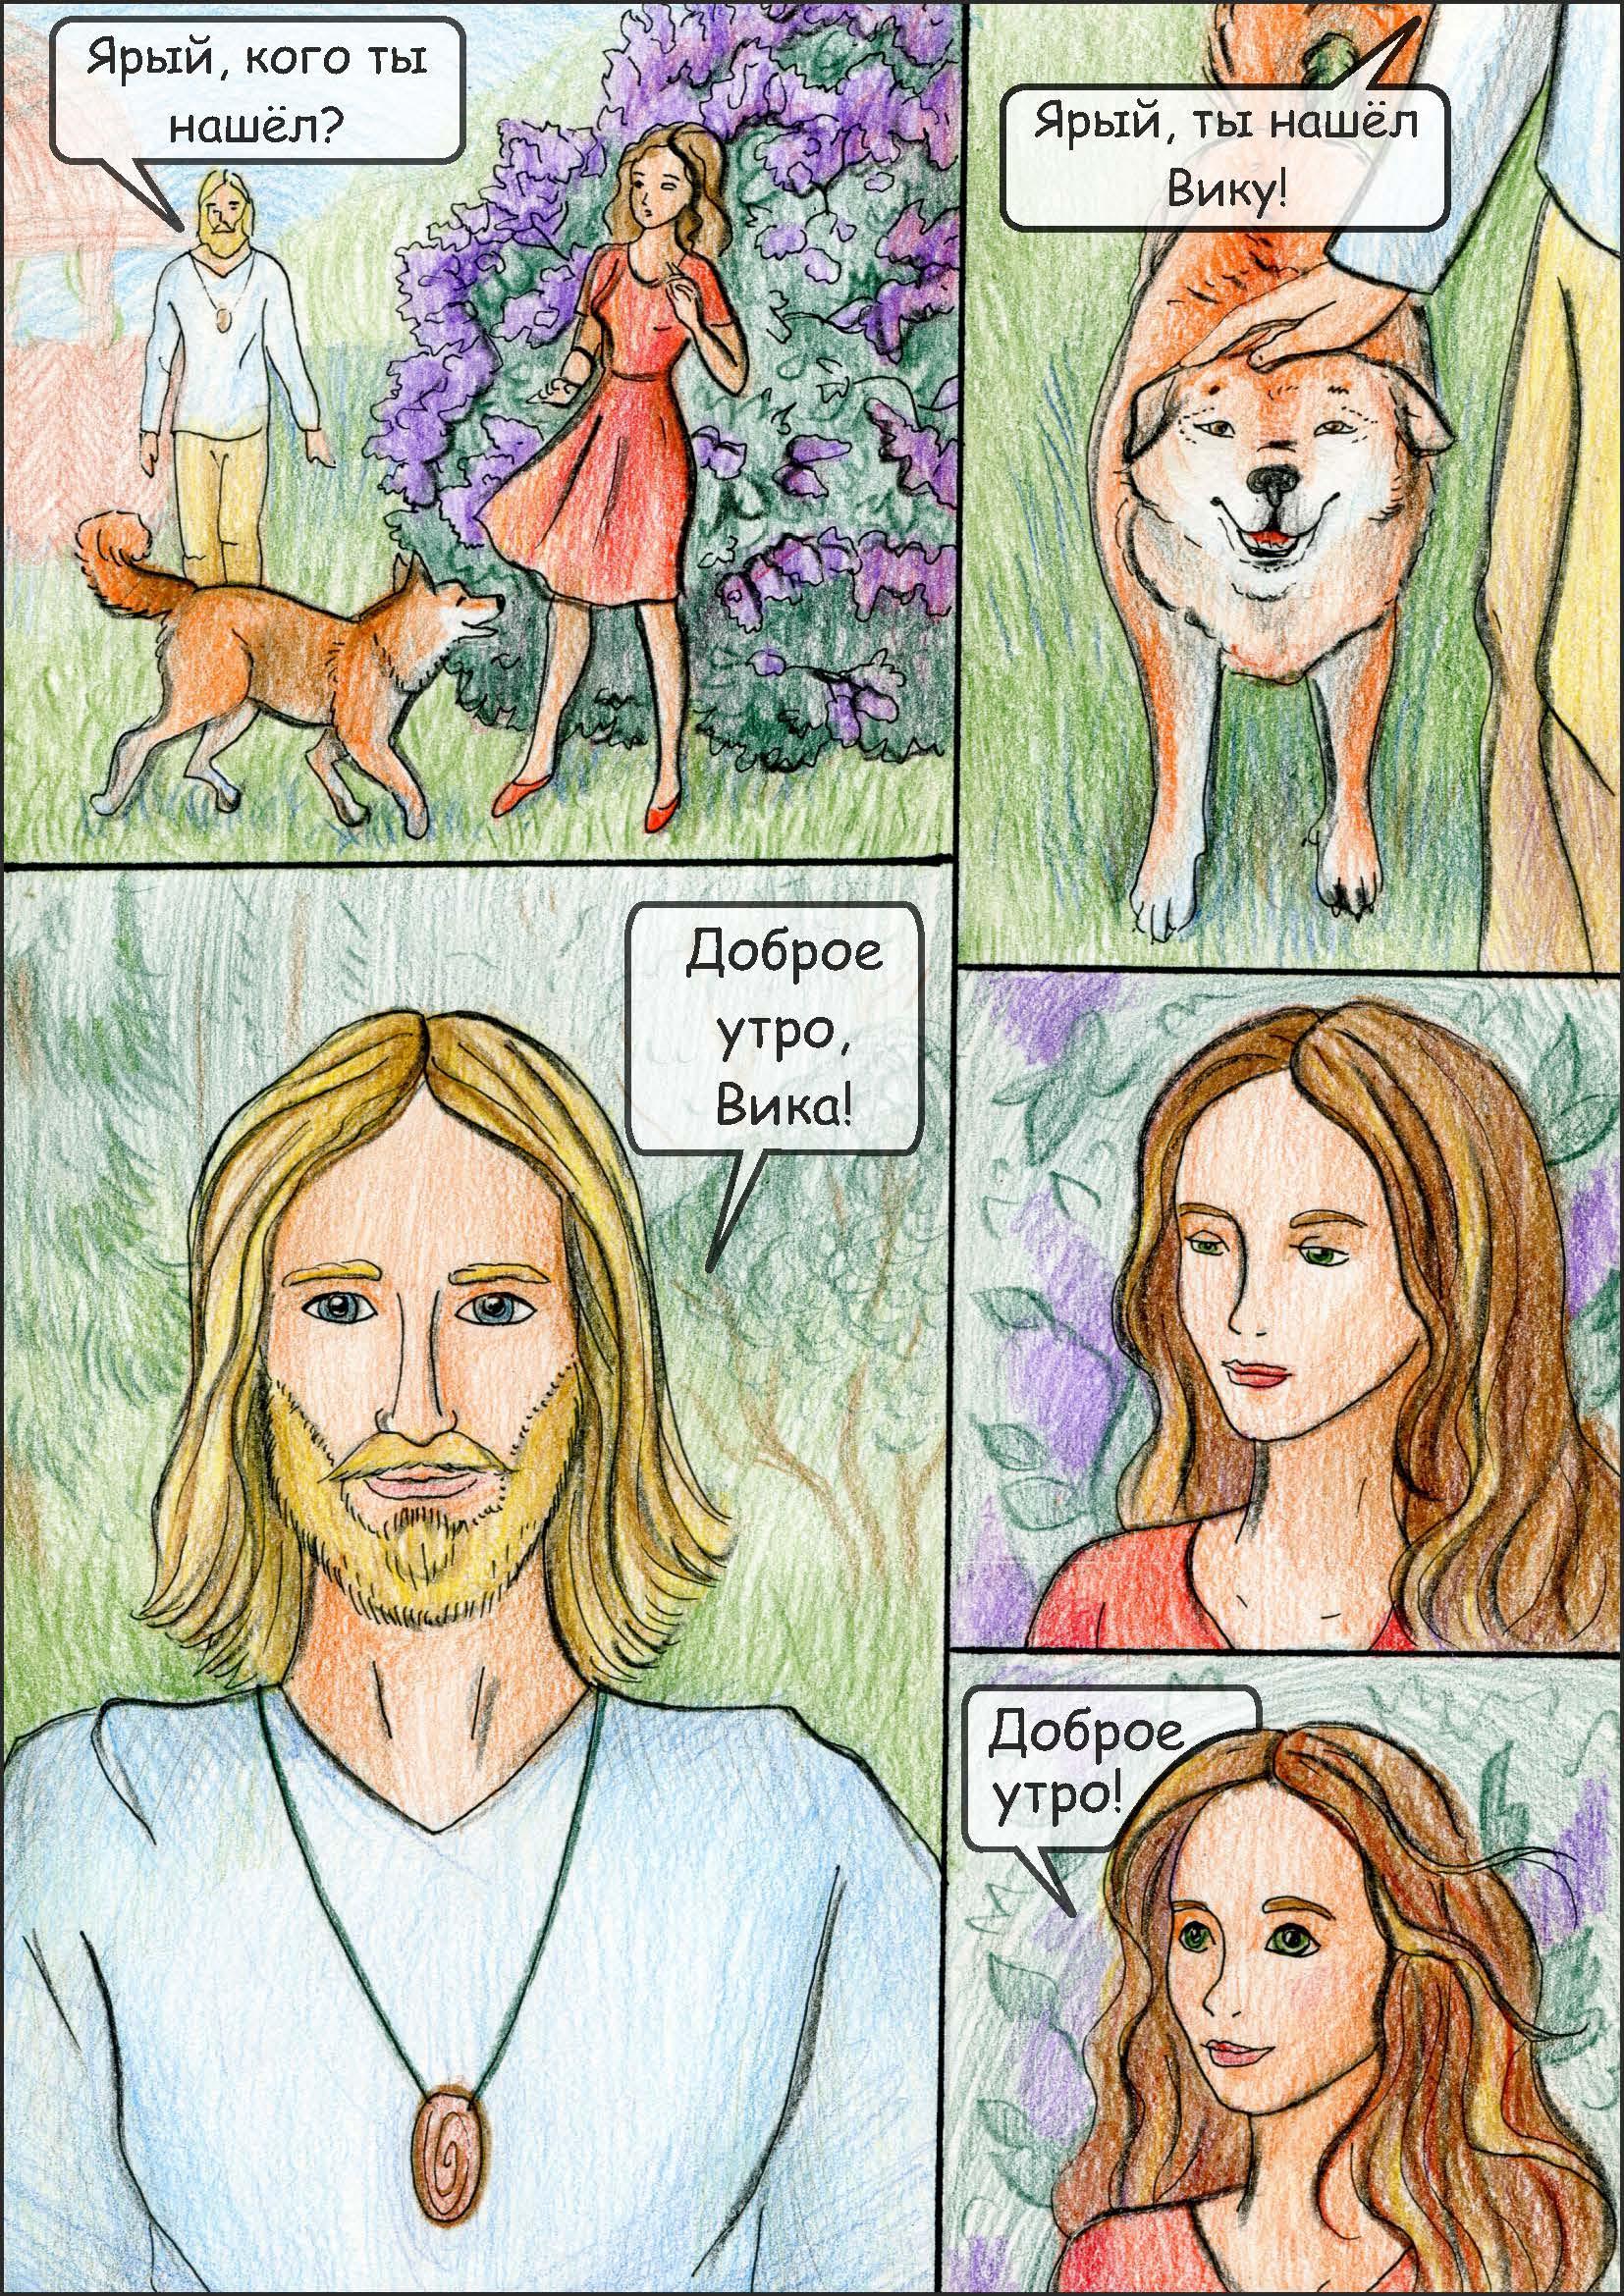 Анна Гейдебрехт. Комикс Зовущая мечта (13).jpg